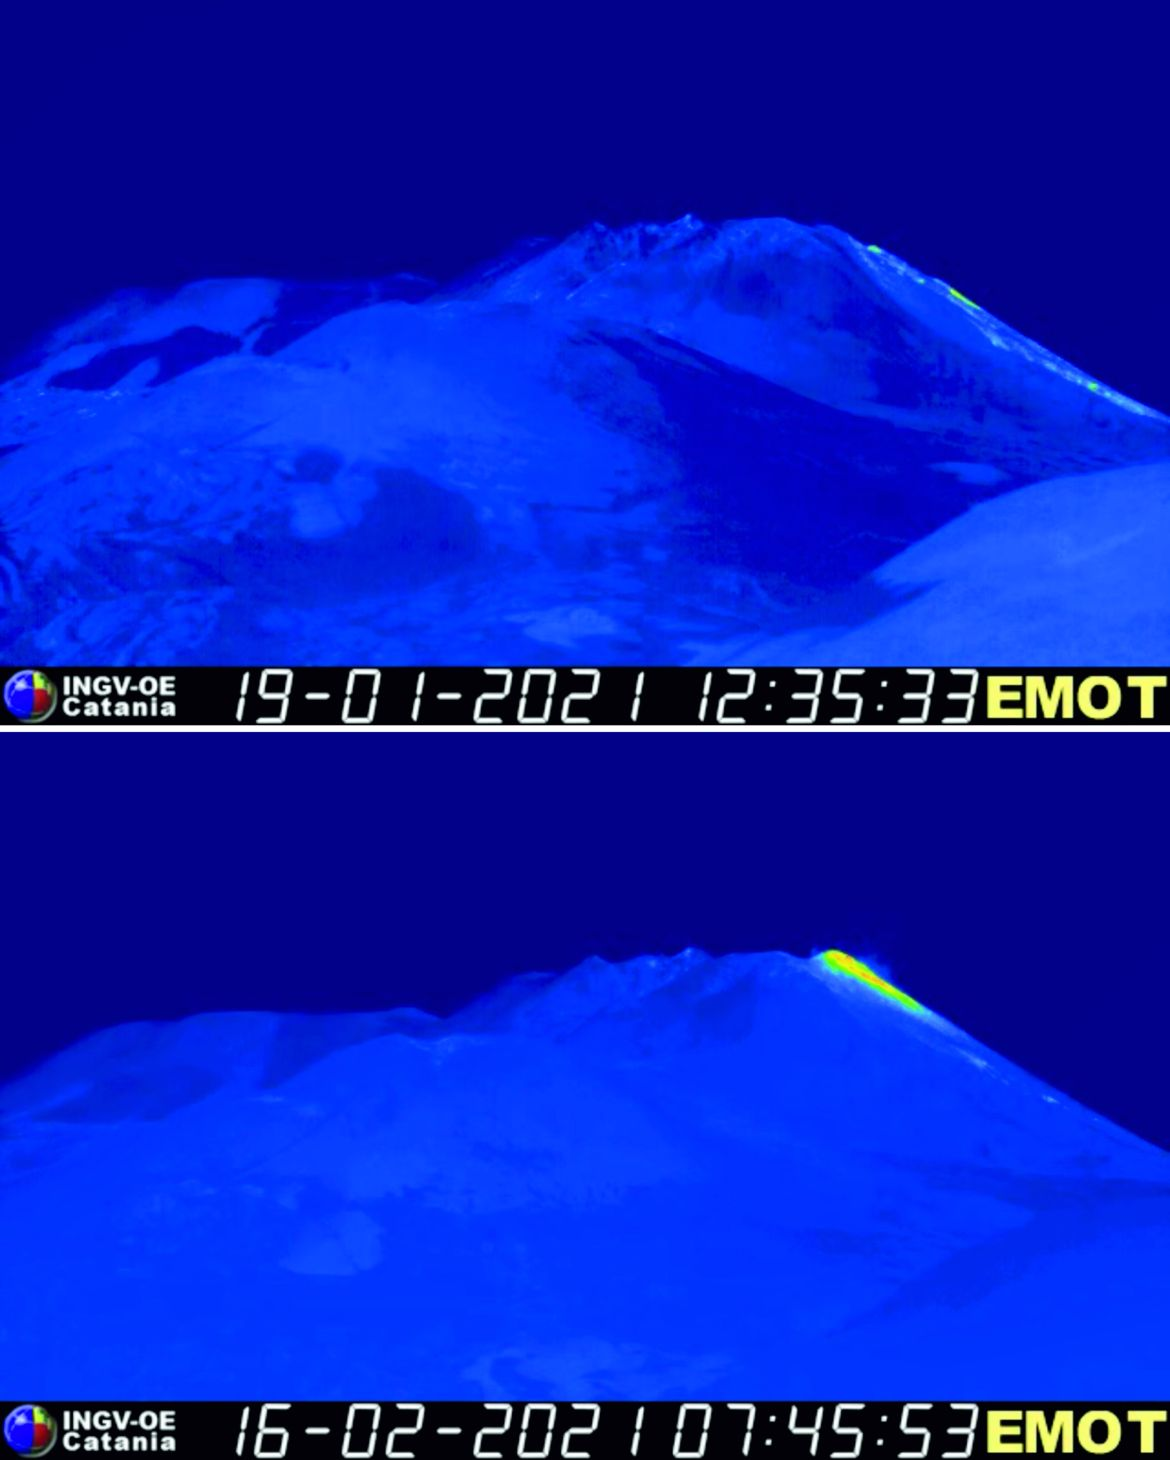 Etna 16 febbraio 2021 02